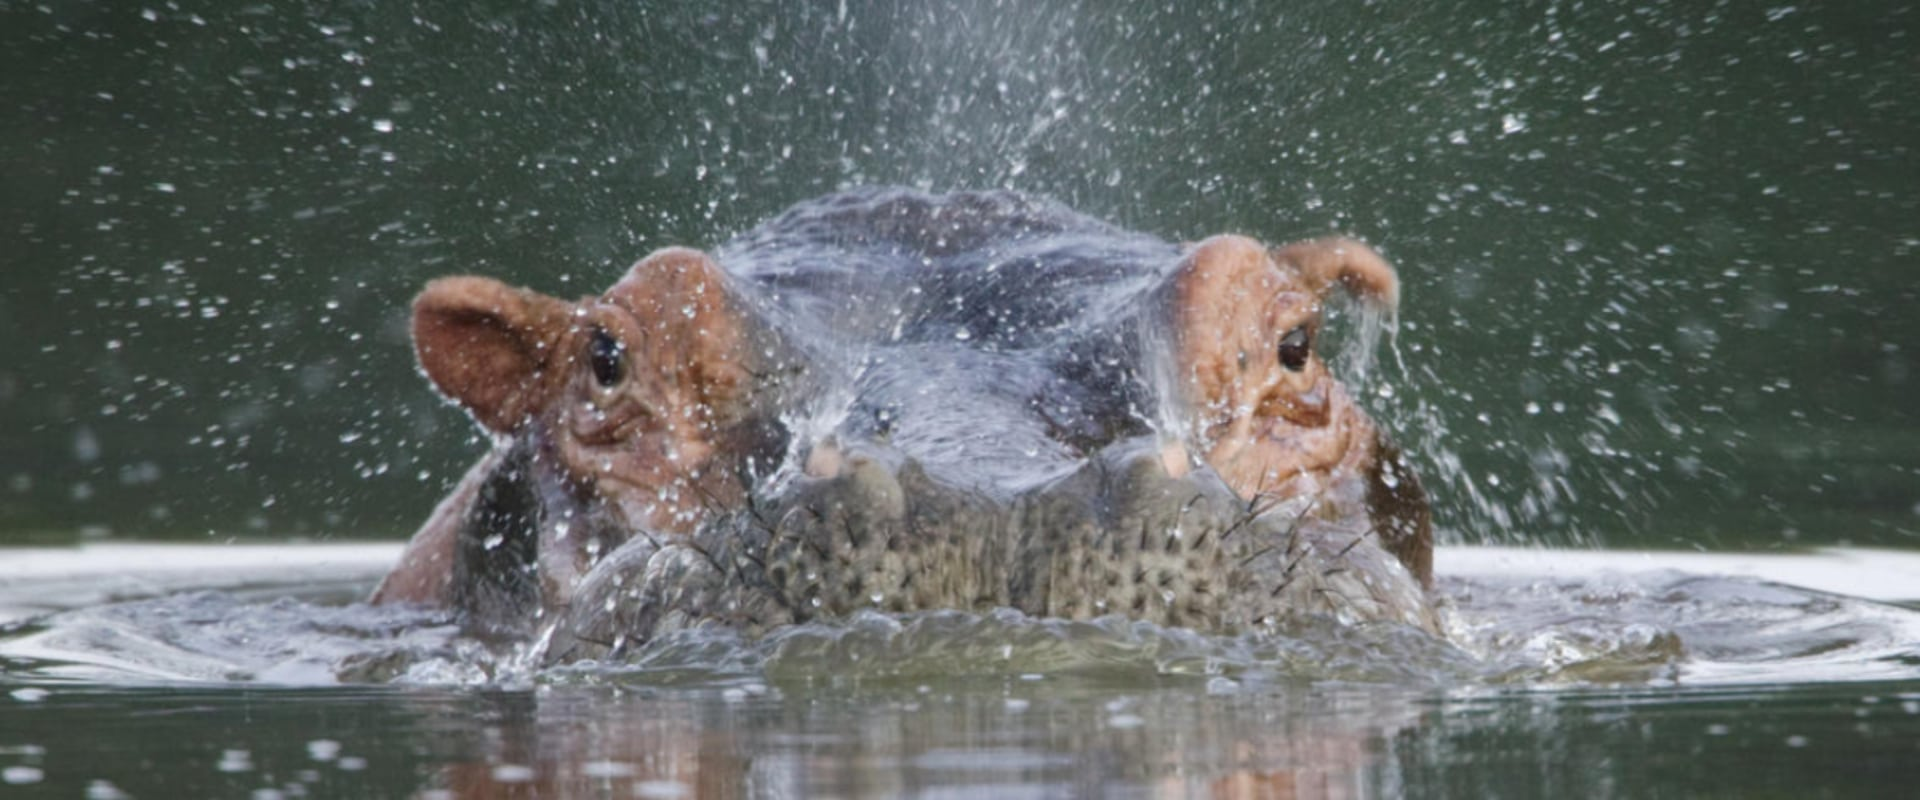 Photographic Safaris on the magical Zambezi River